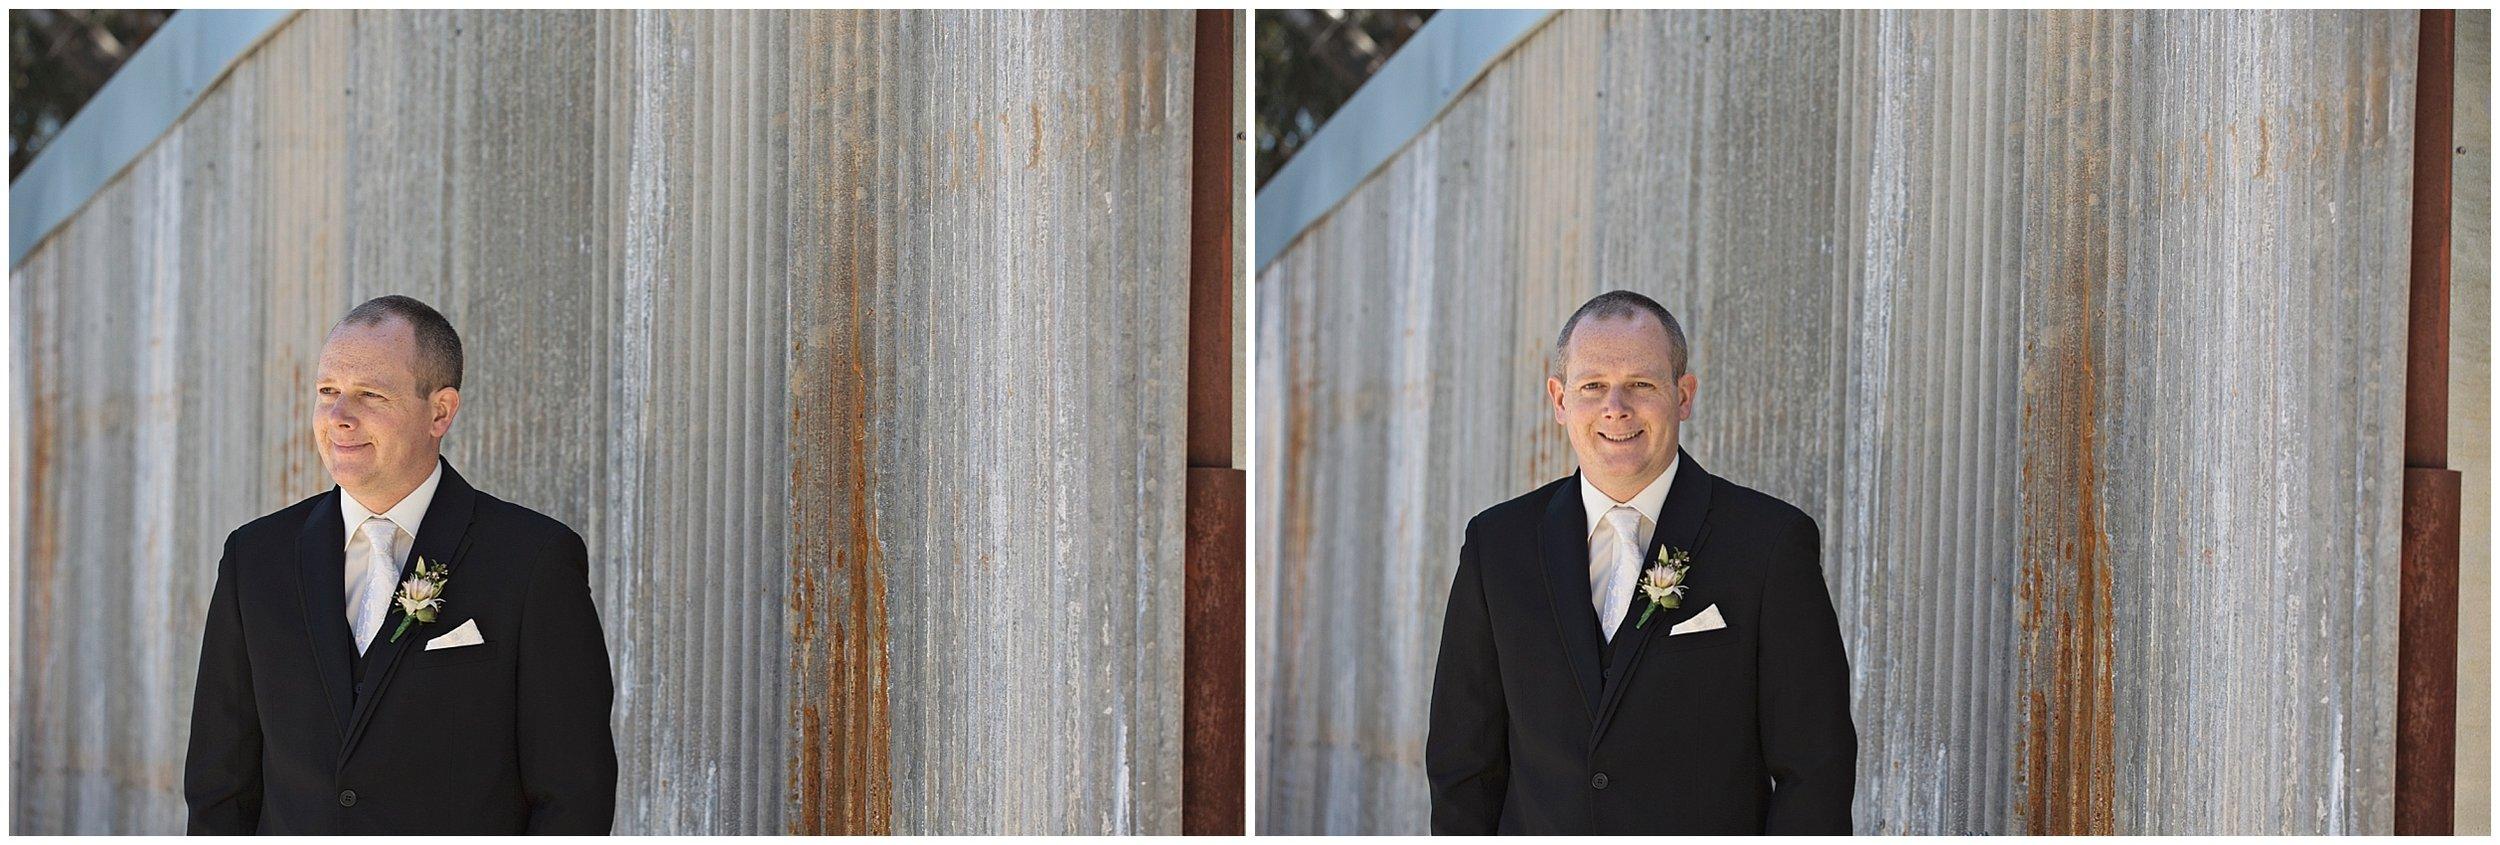 shepparton-wedding-photographer_0022.jpg